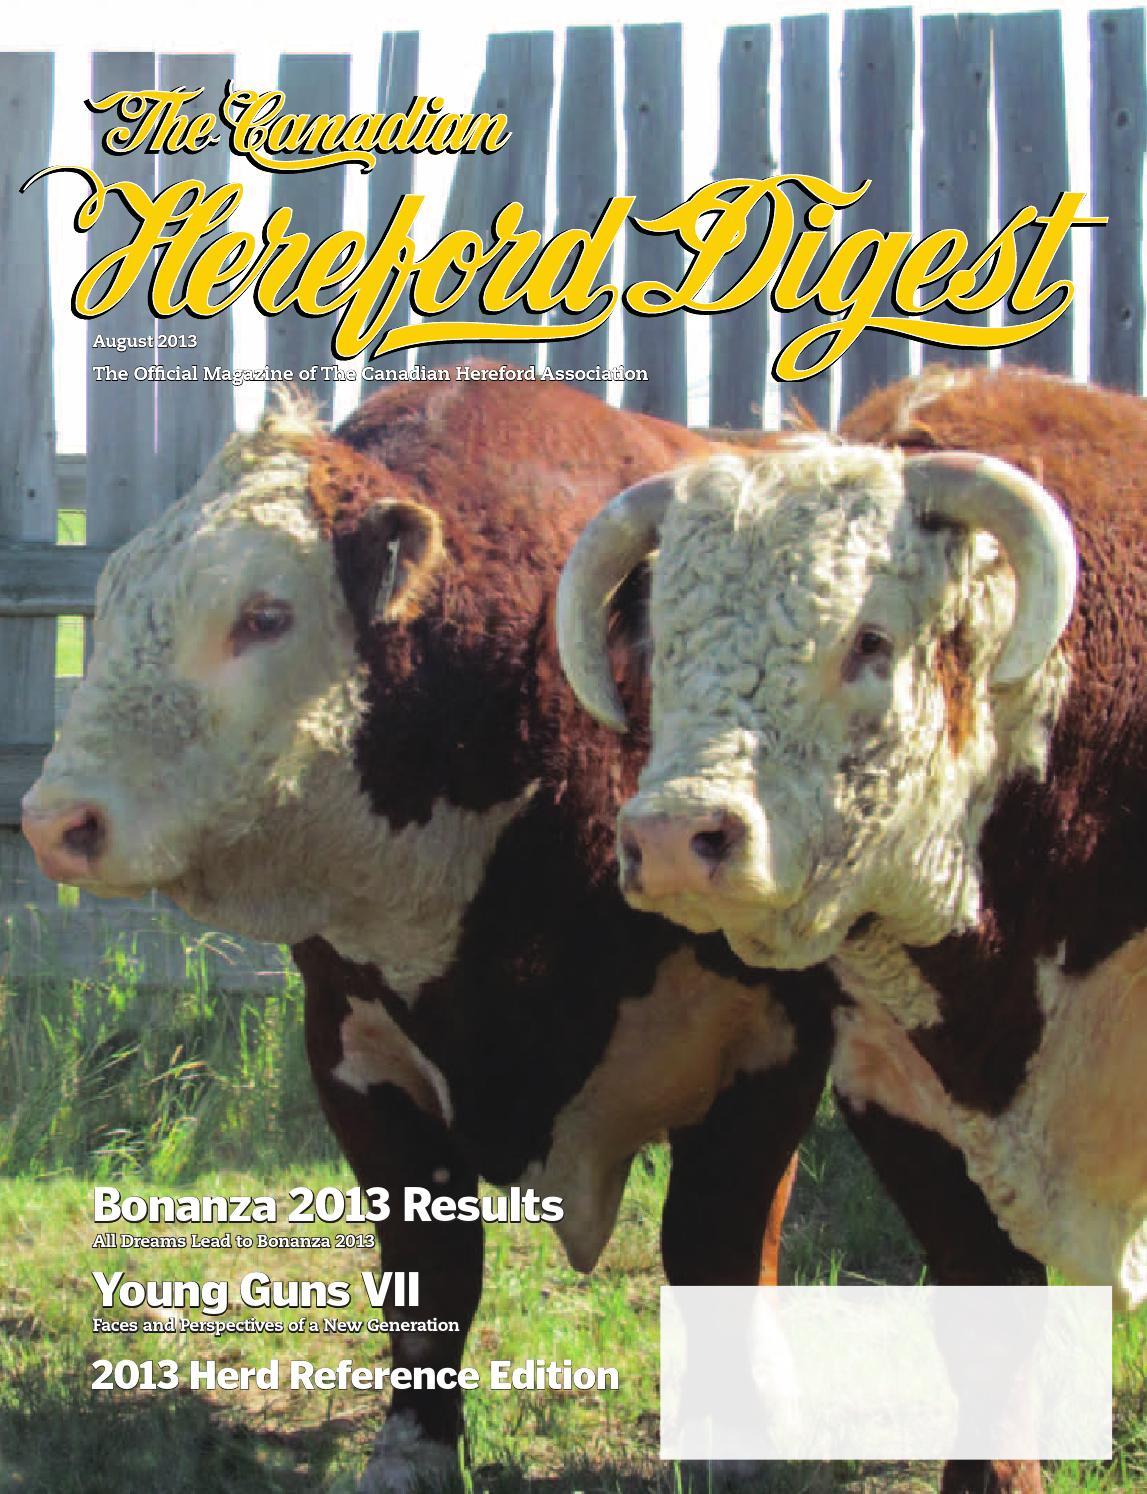 August 2013 Canadian Hereford Digest By Vo Axis Aigo 1 Gb Non Bonus Association Issuu